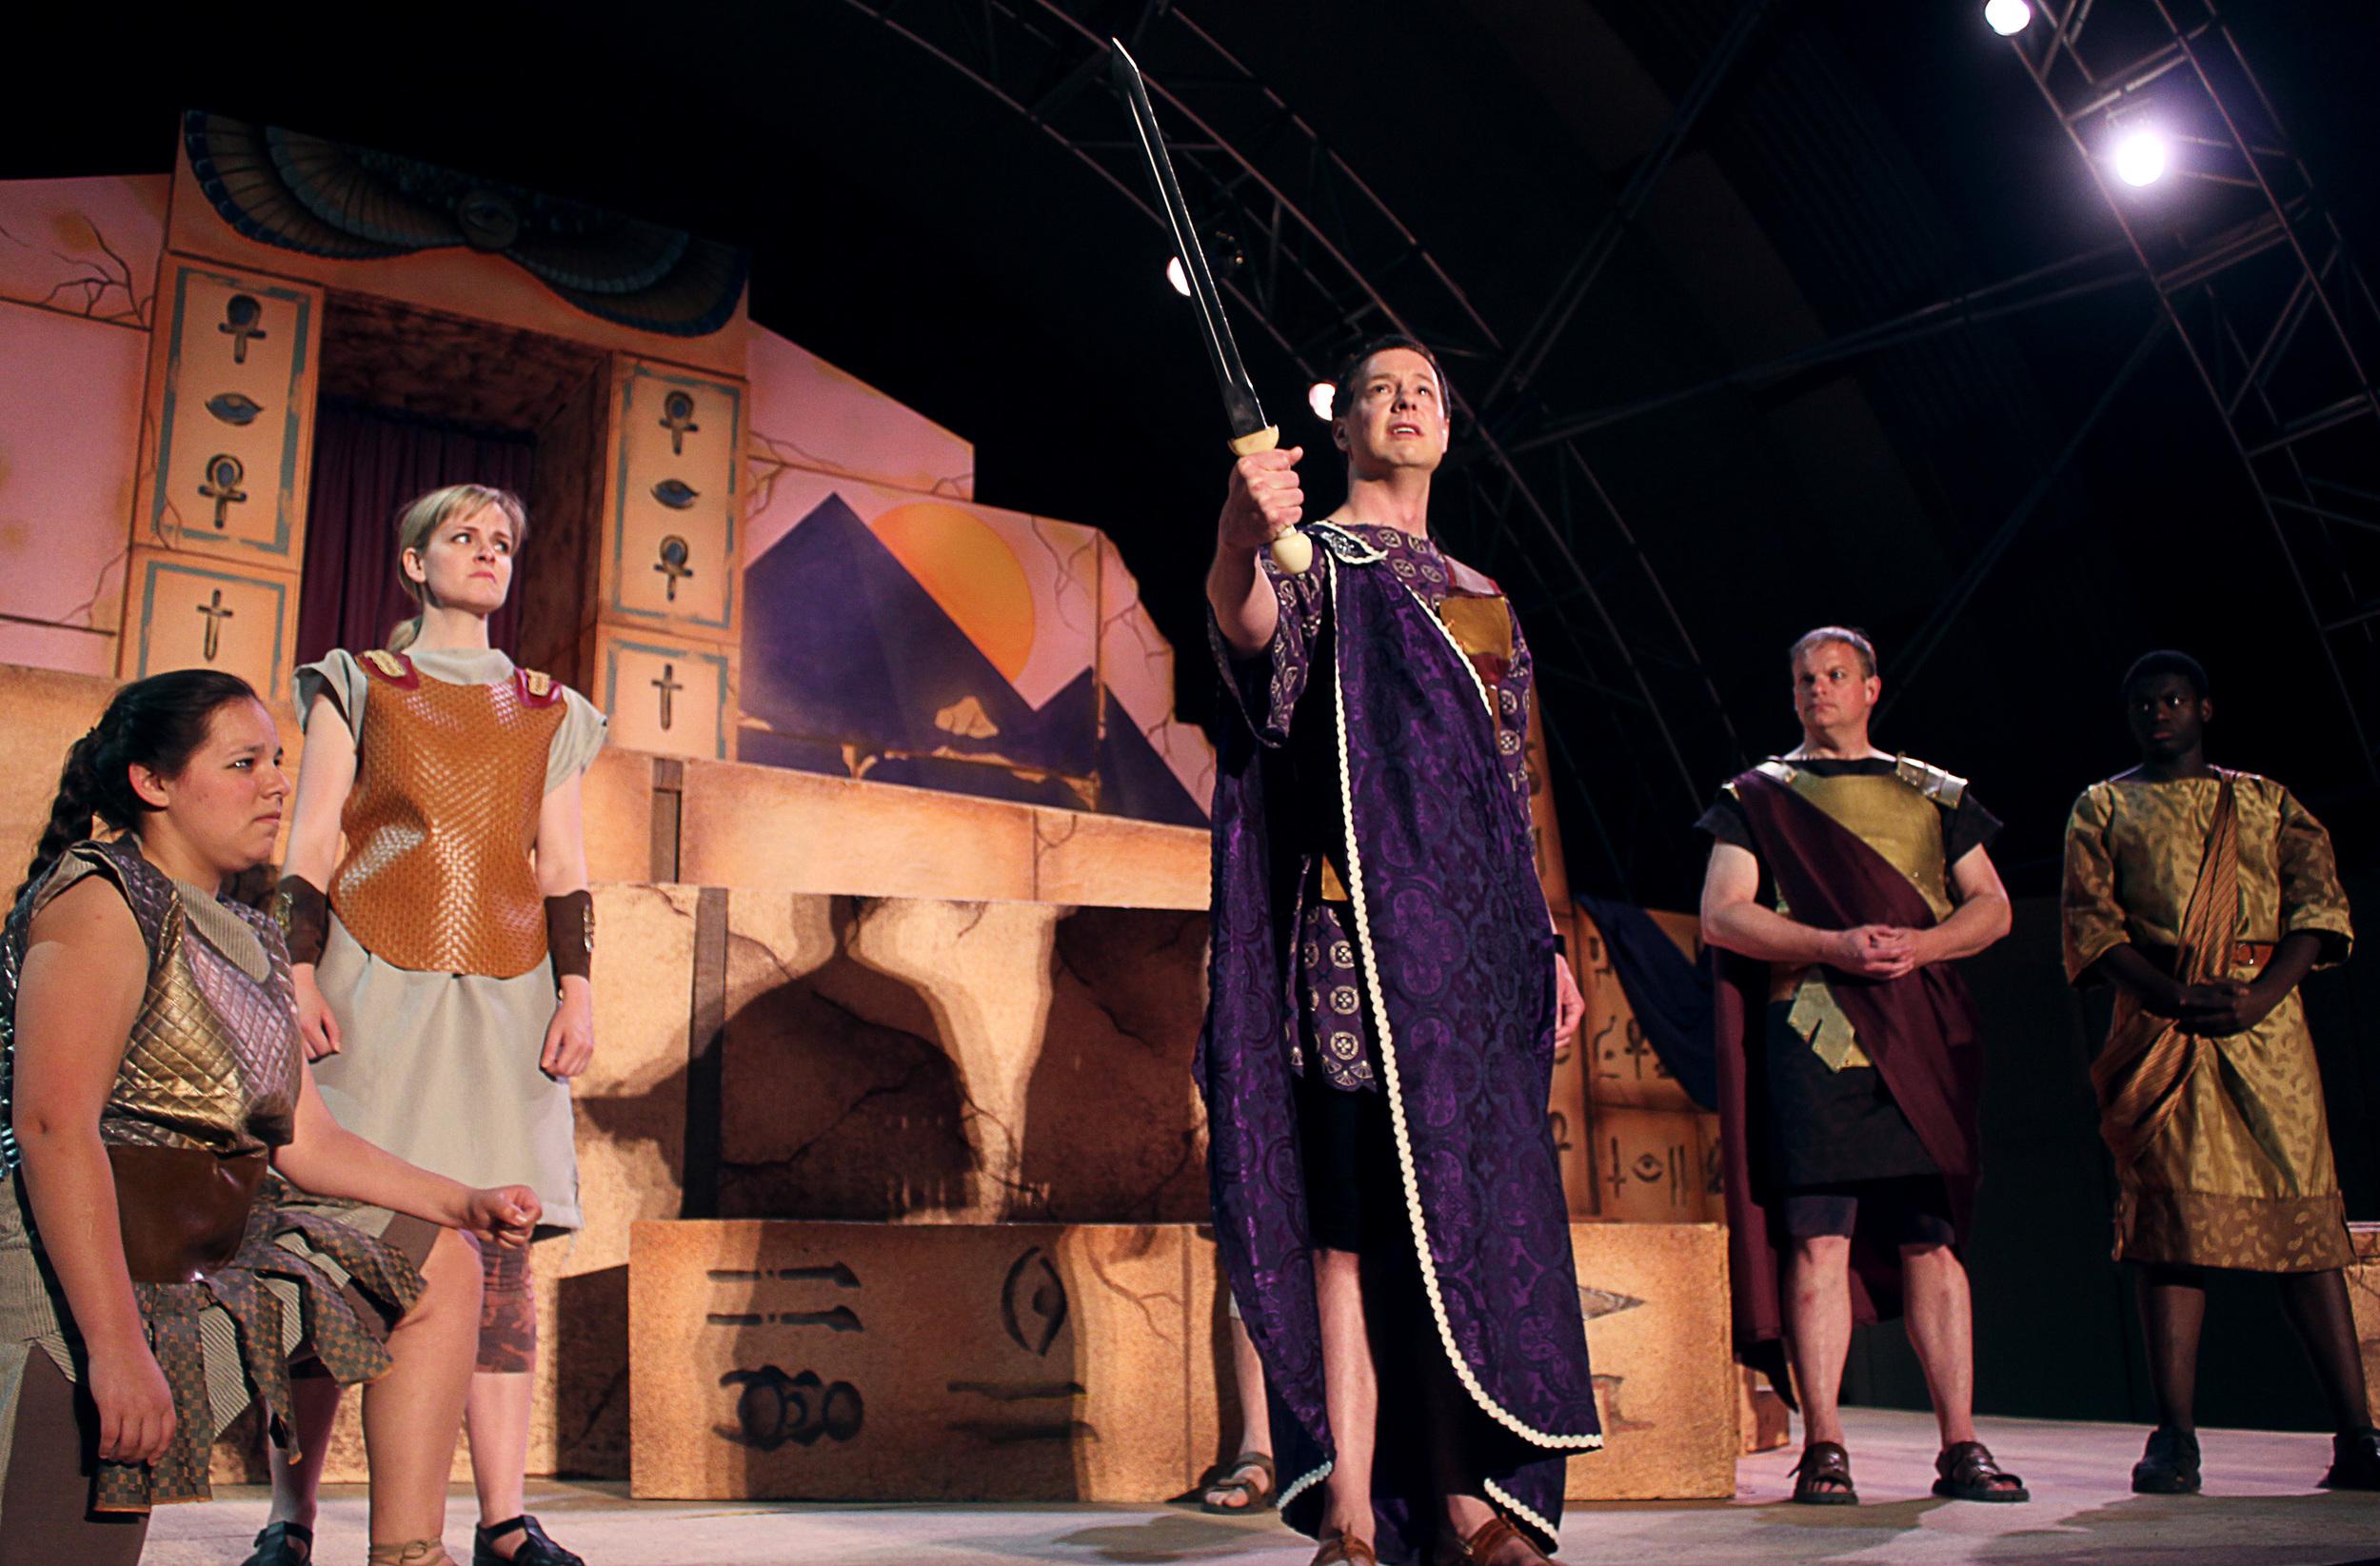 Diomedes (Grace Hoover), Gallus (Kathryn Miller), Octavius (Jeff Luttermoser), Agrippa (David Richwine), Mecaenas (Bernard Joseph)